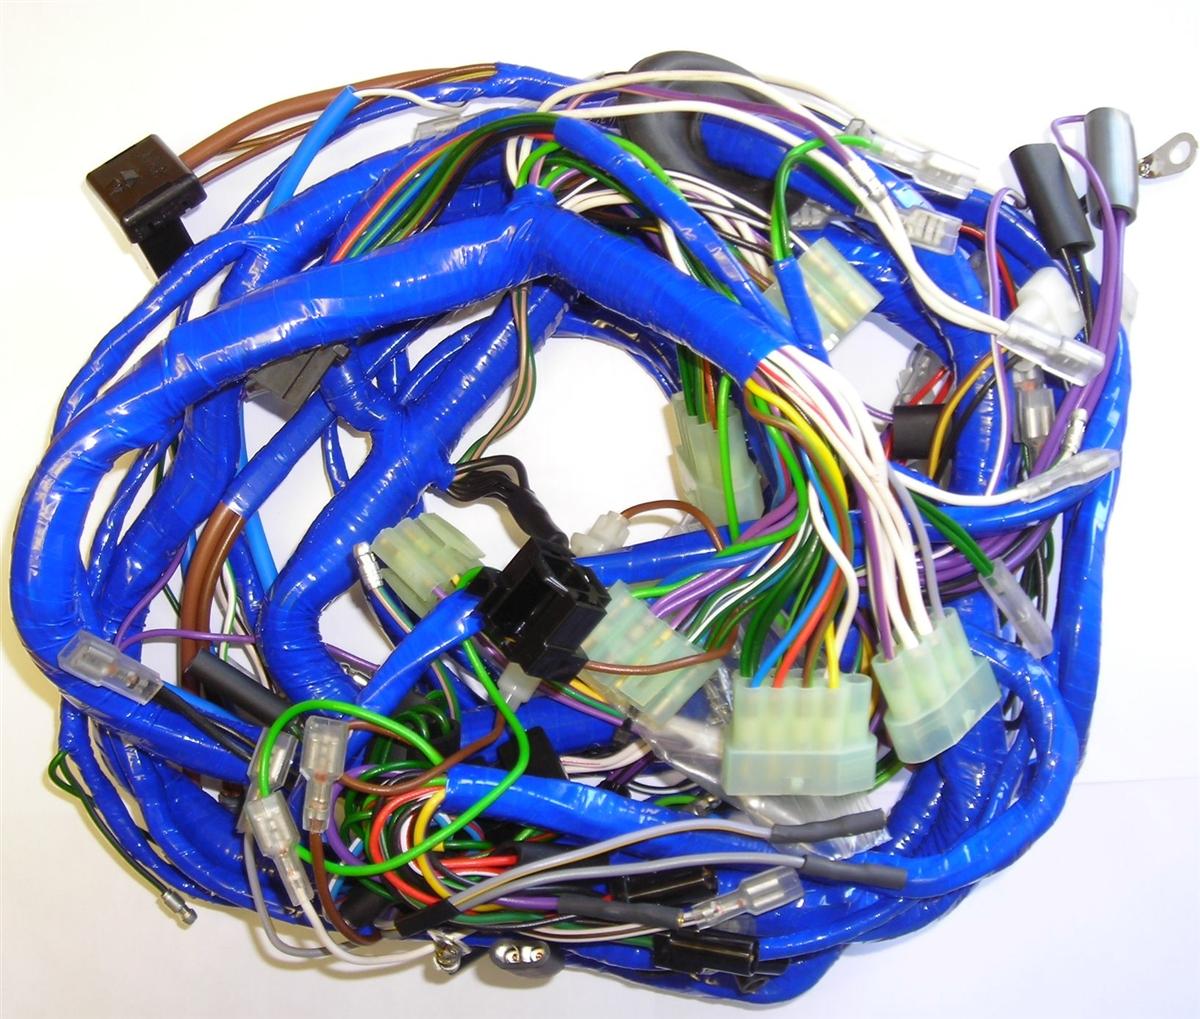 1975 MGB Main Wiring Harness, Federal Spec.British Wiring